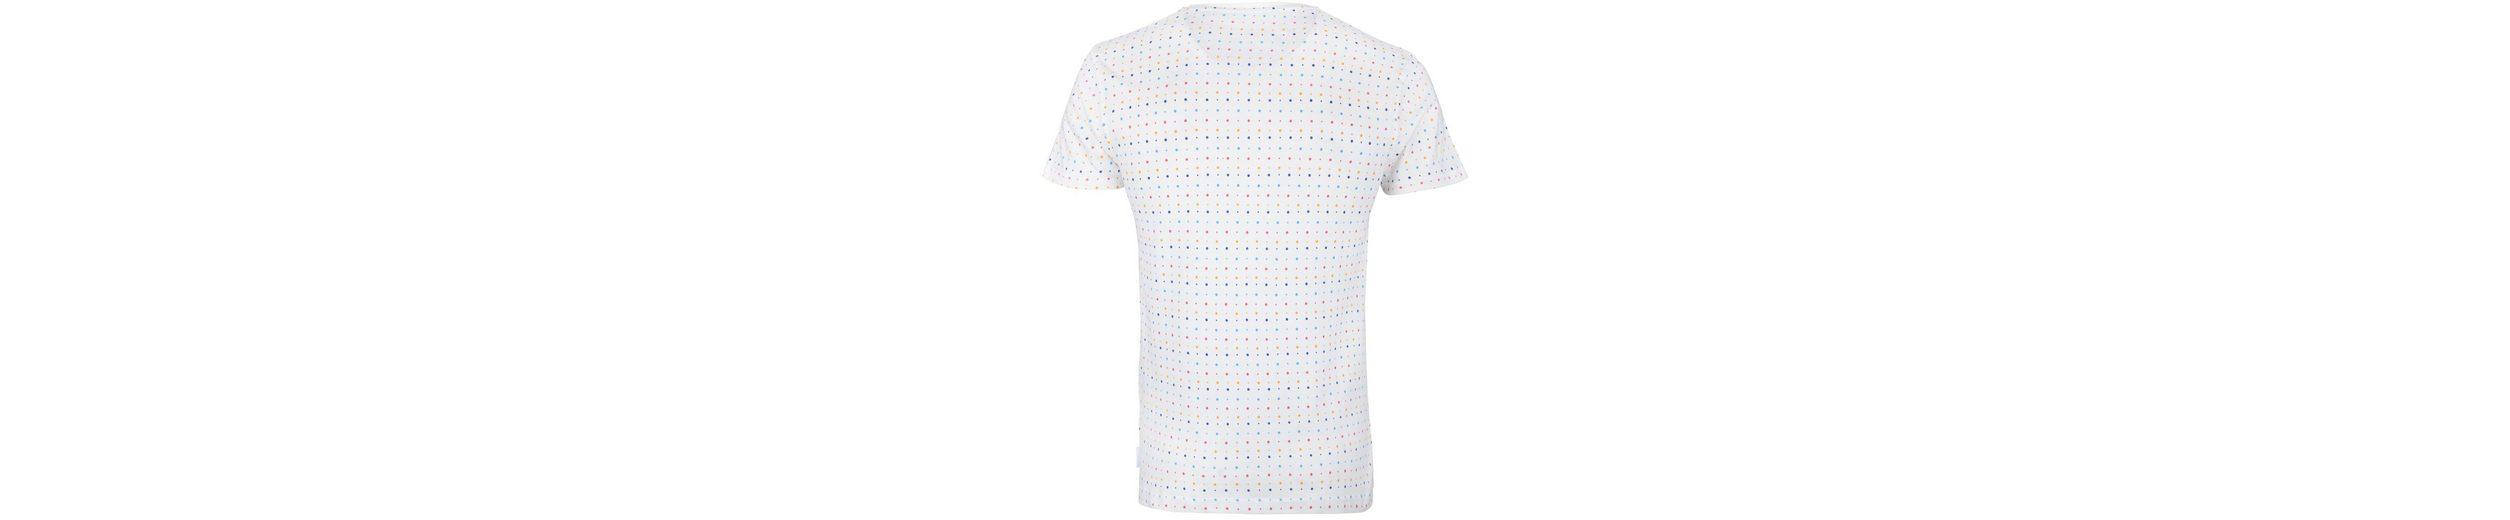 Steckdose Footaction Verkauf Limitierter Auflage SOULSTAR T-Shirt Oe51j